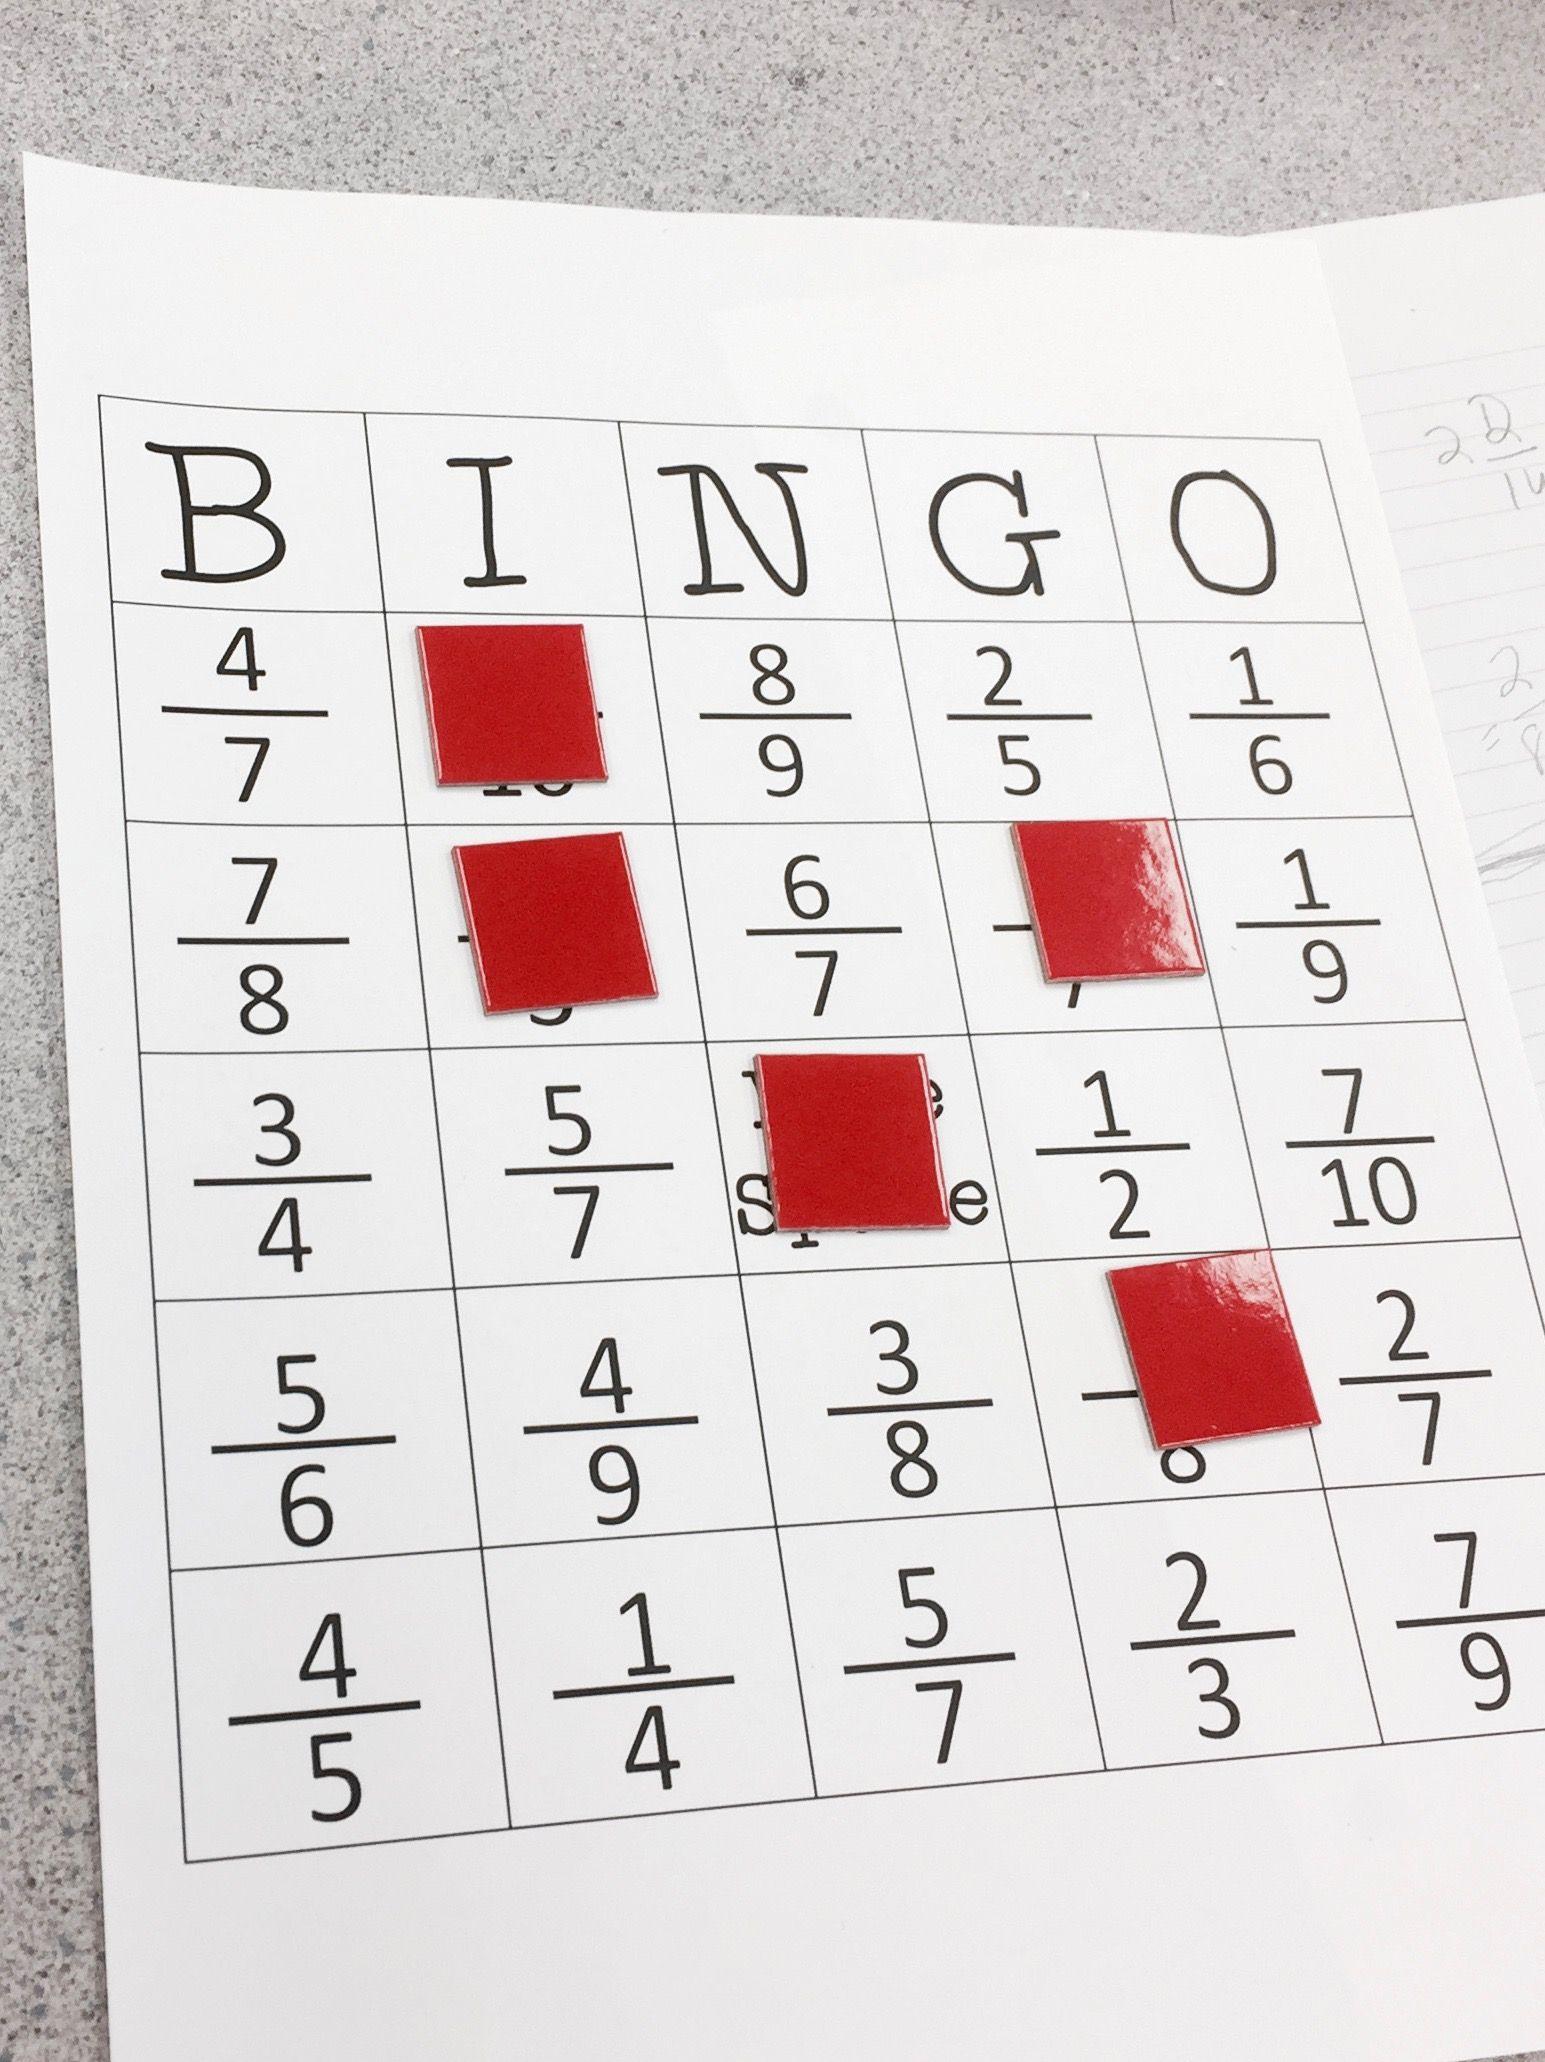 Equivalent Fraction Bingo | Fractions, Fractions Worksheets